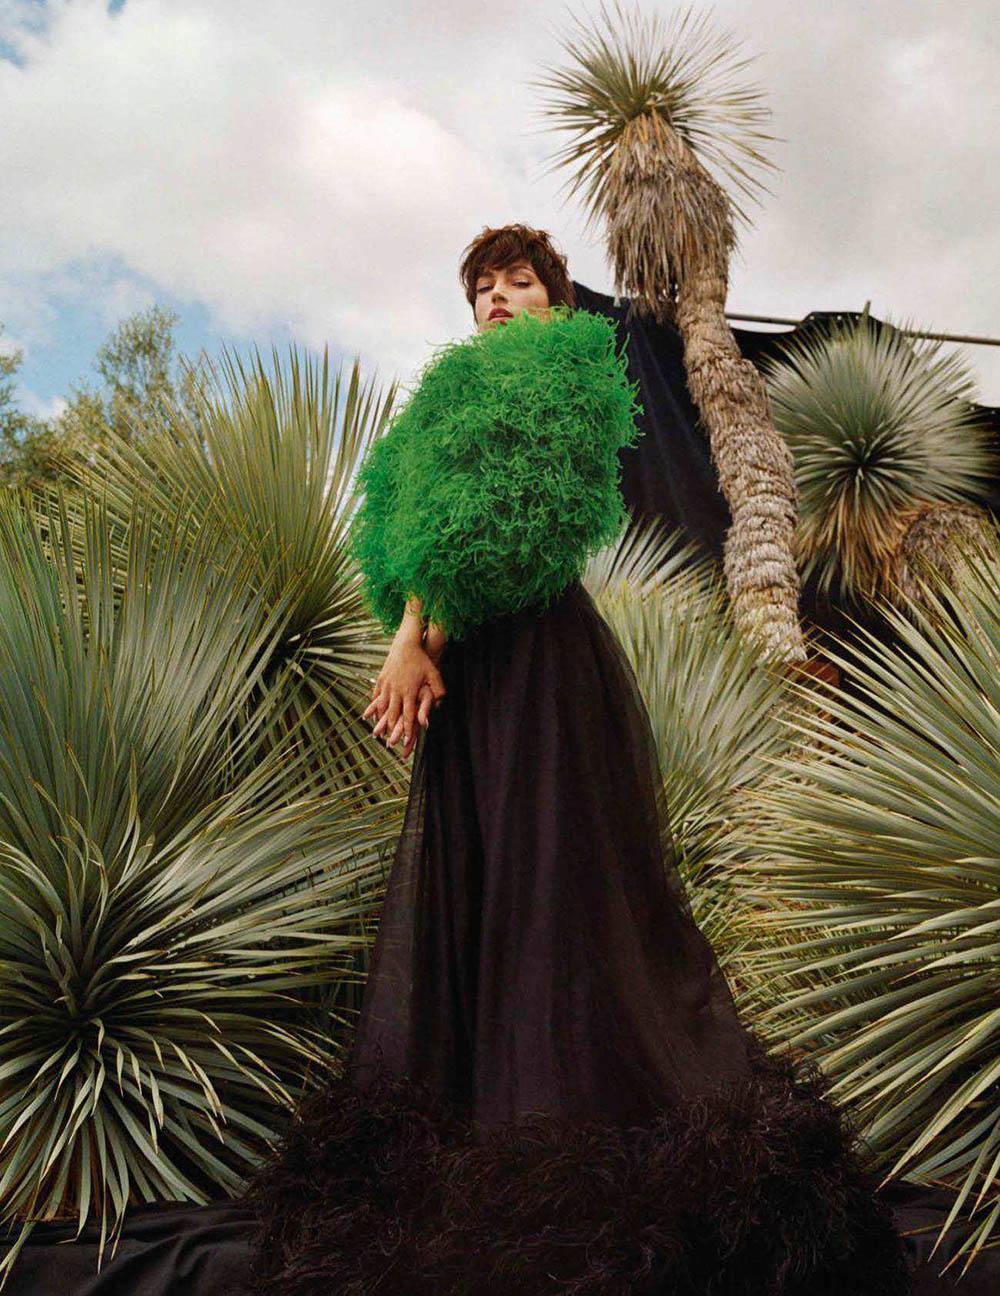 Úrsula Corberó by Gorka Postigo for Vogue Spain August 2018